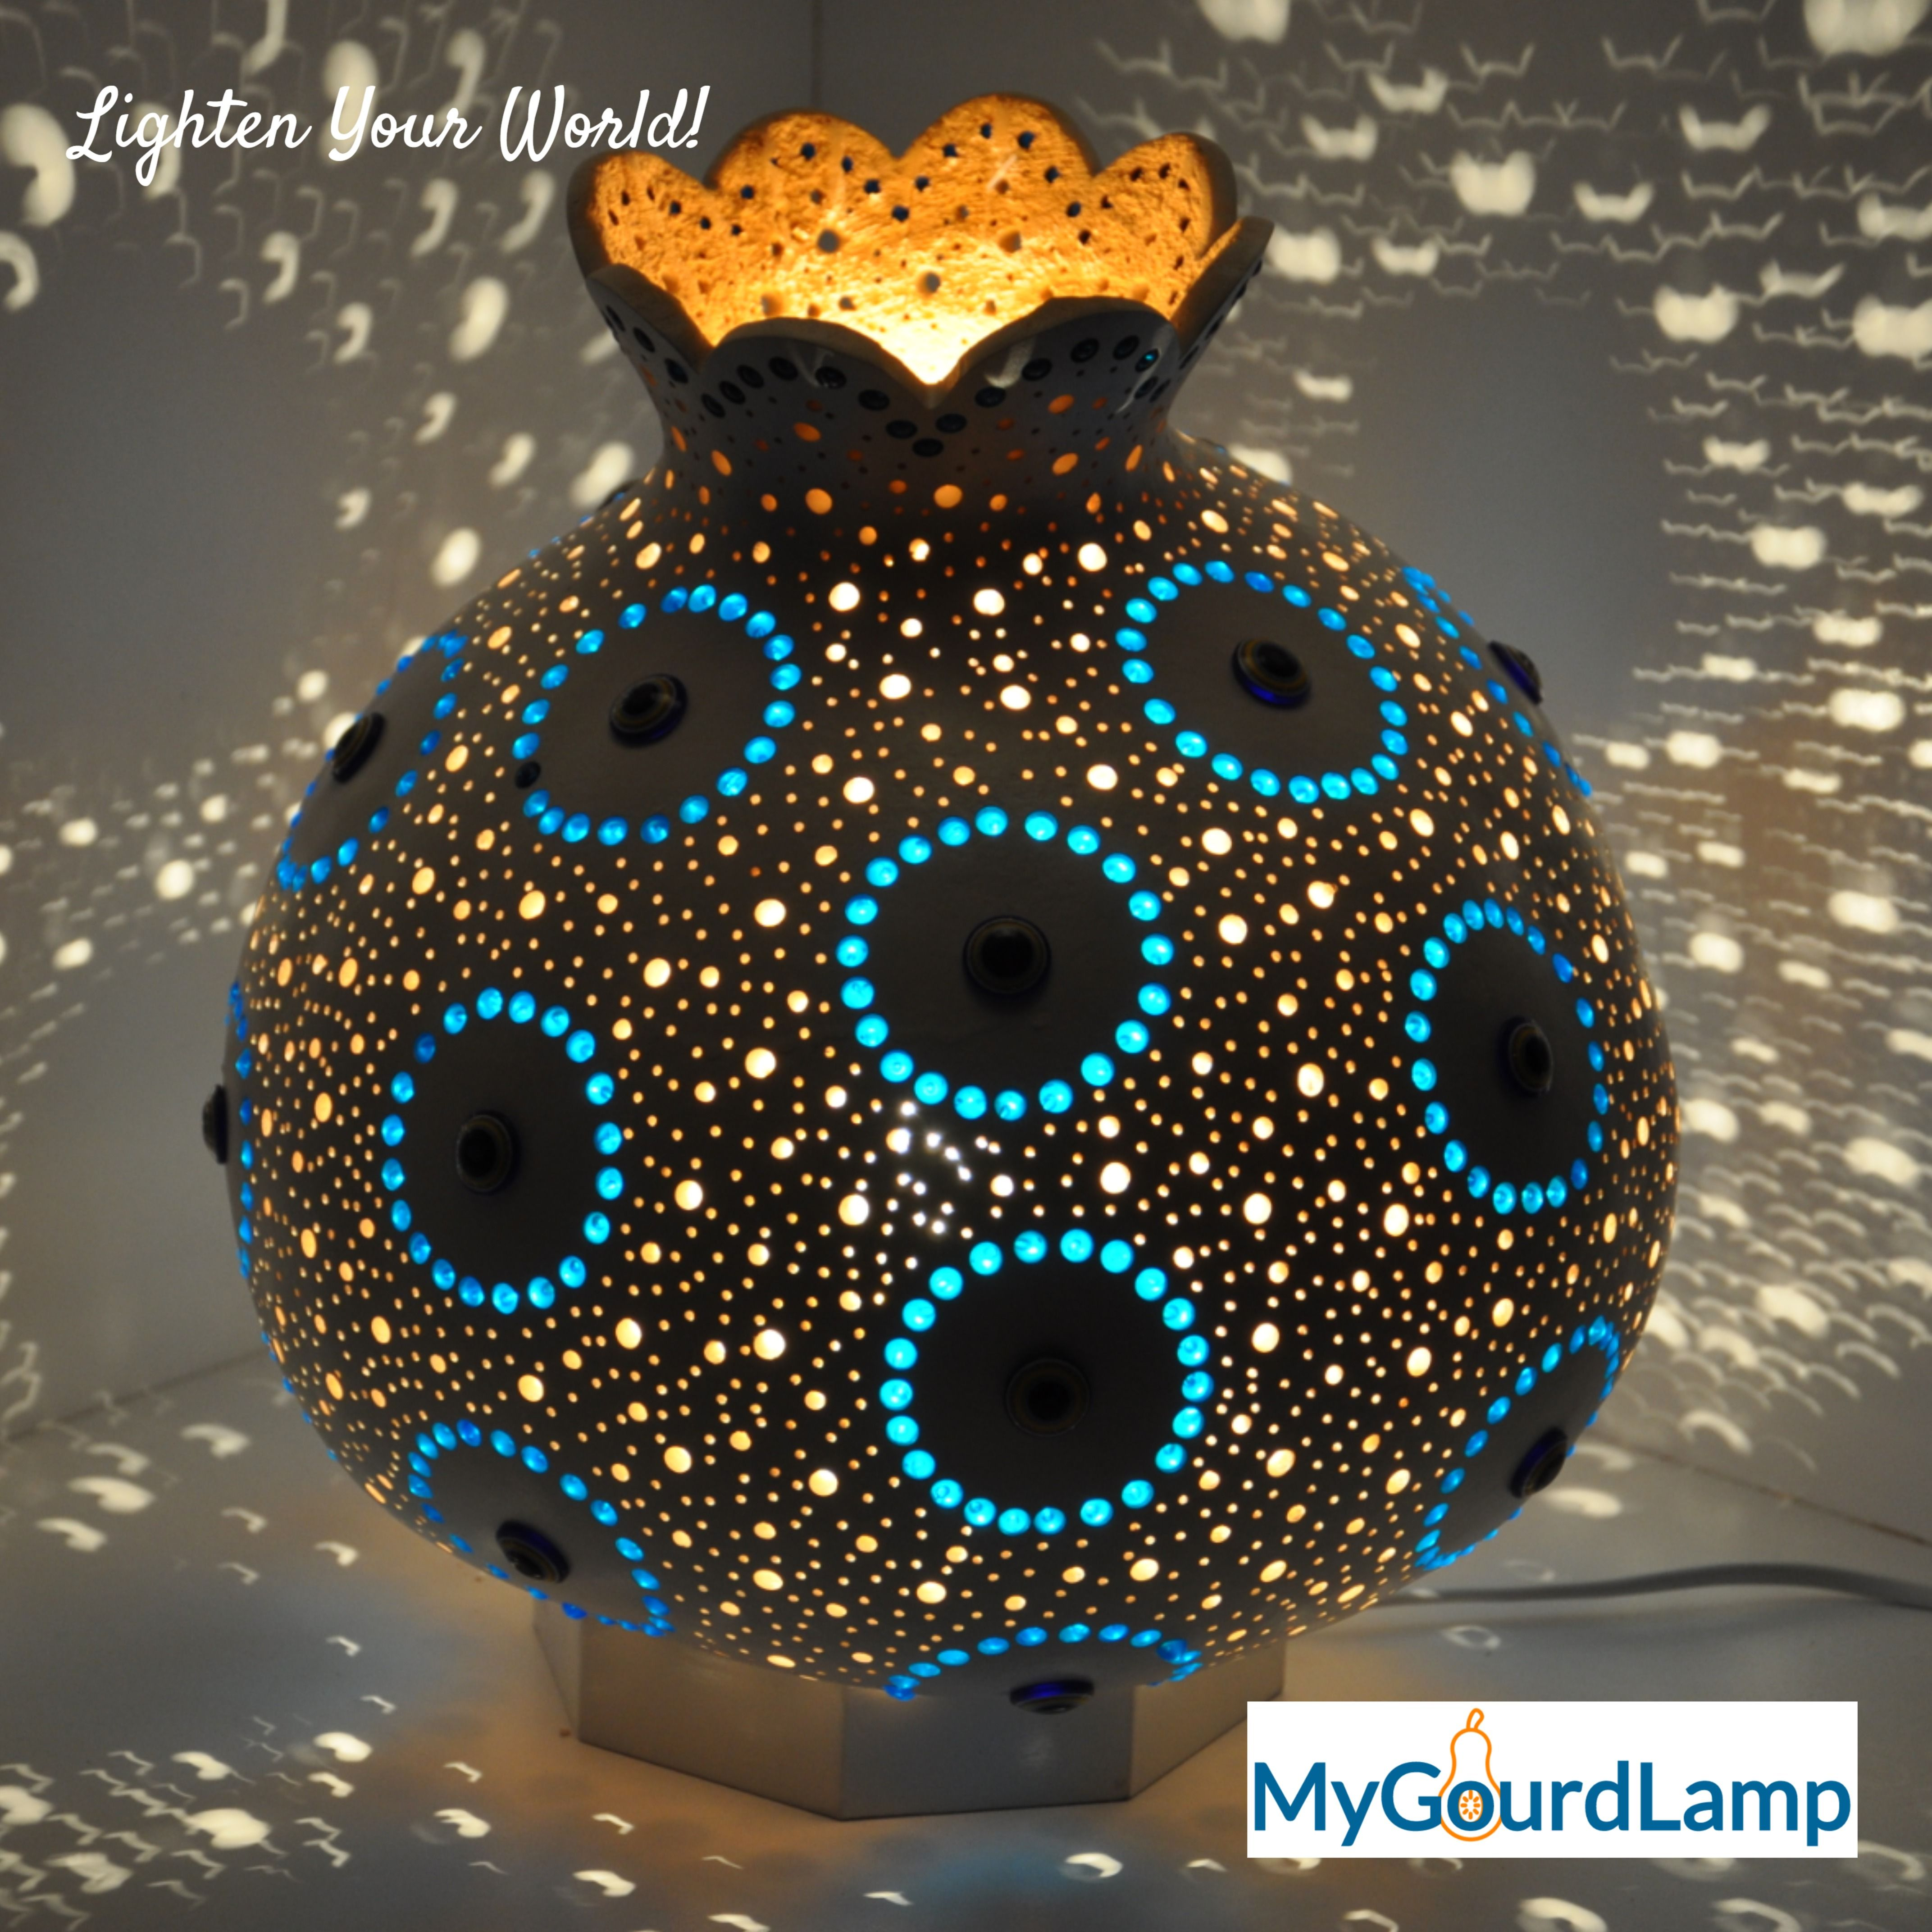 Traditional Turkish Evil Eye Talisman Handmade Gourd Lamp Etsy In 2021 Gourd Lamp Gourd Art Gourds